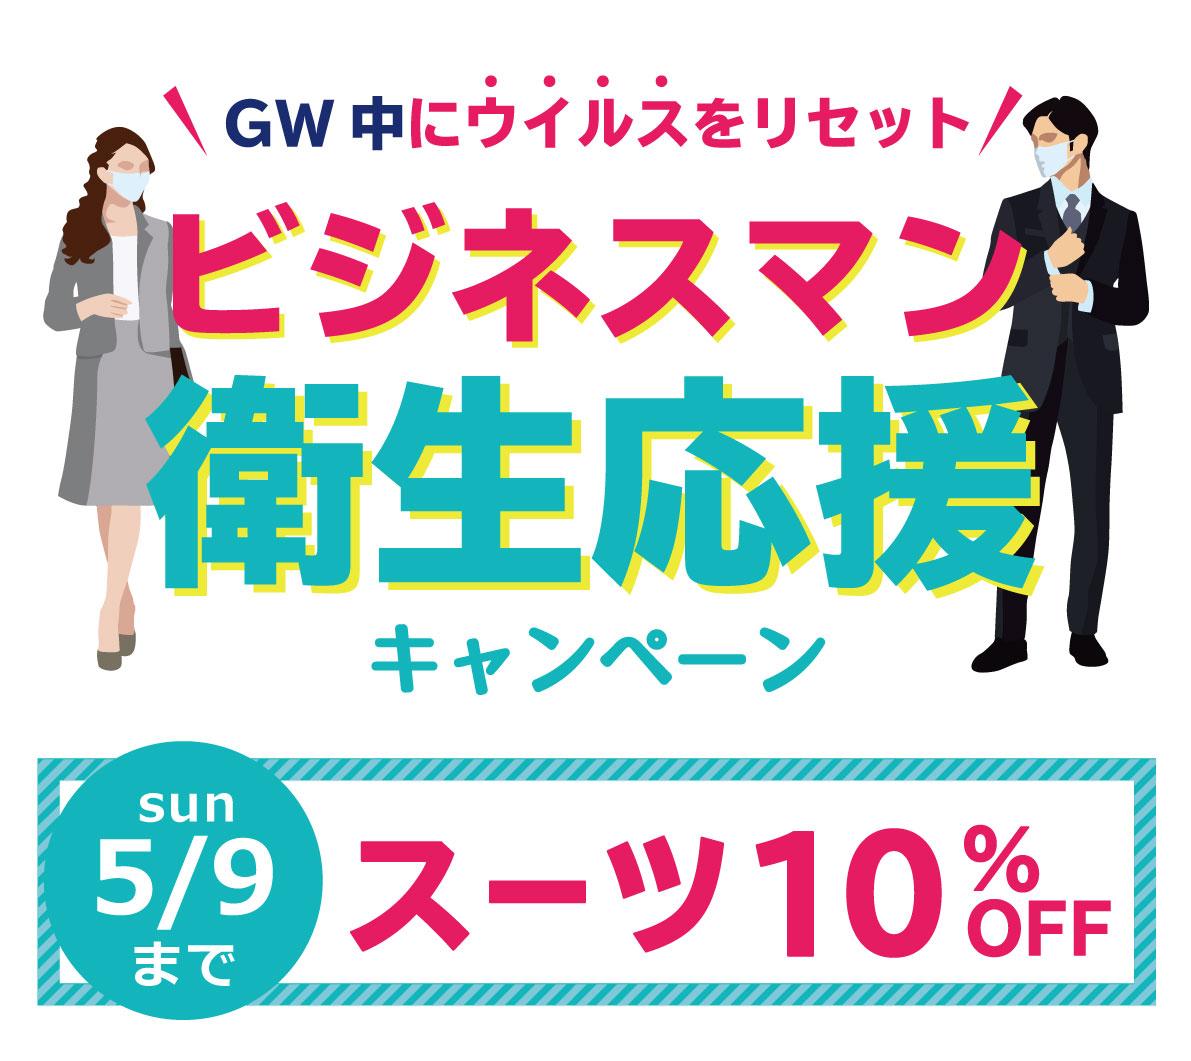 GWビジネスマン衛生応援キャンペーン